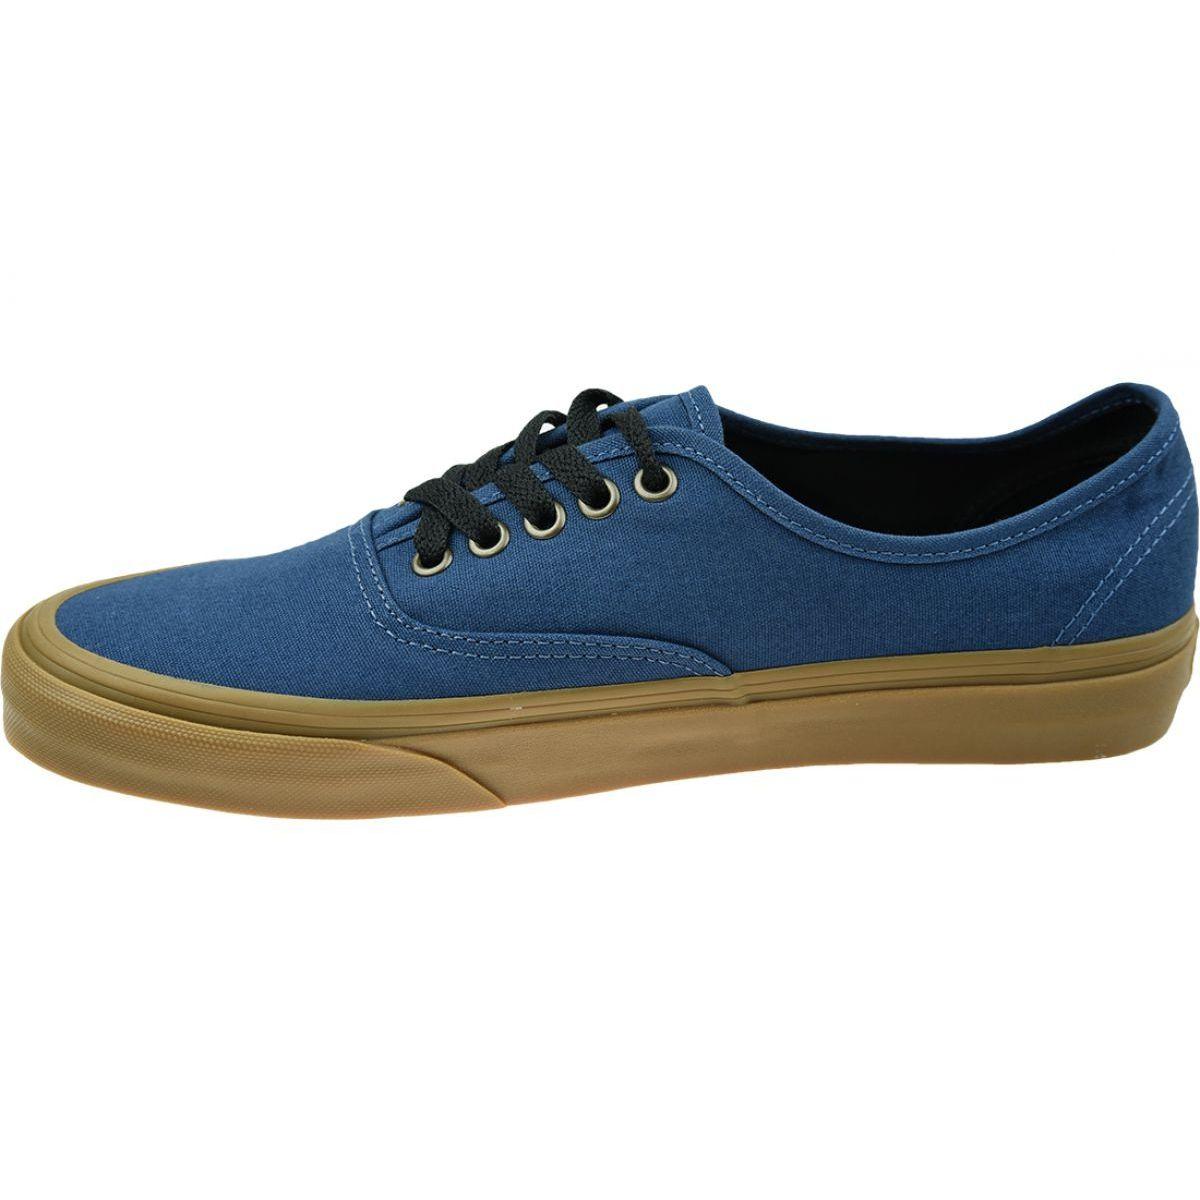 Buty Vans Ua Authentic M Vn0a38emu4c1 Niebieskie In 2021 Blue Shoes Vans Shoes